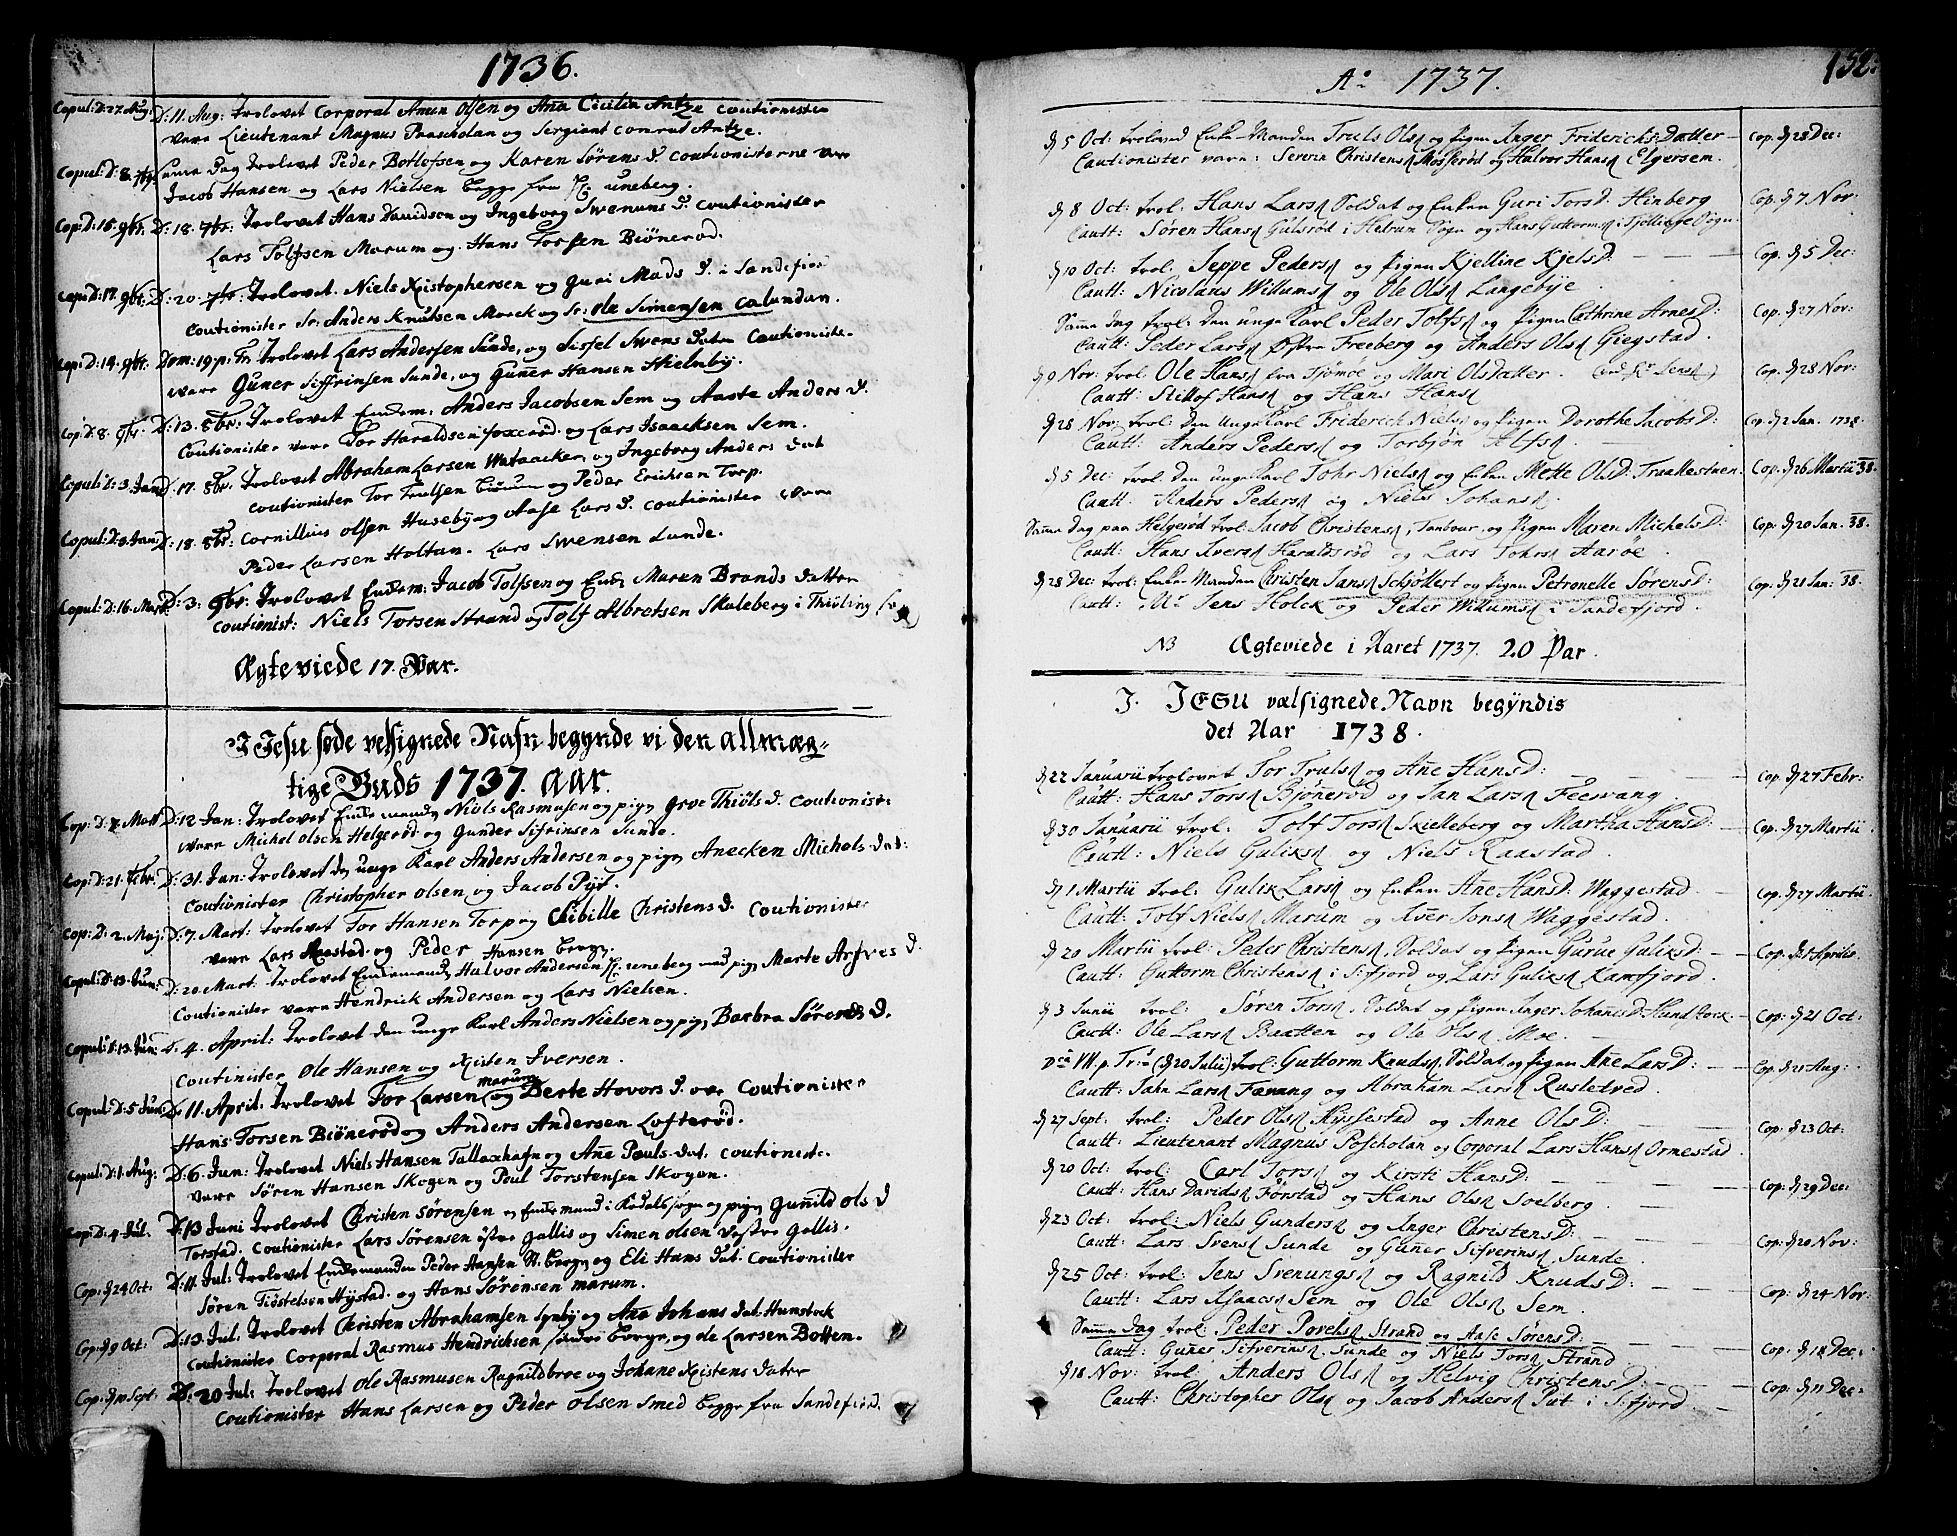 SAKO, Sandar kirkebøker, F/Fa/L0002: Parish register (official) no. 2, 1733-1788, p. 152